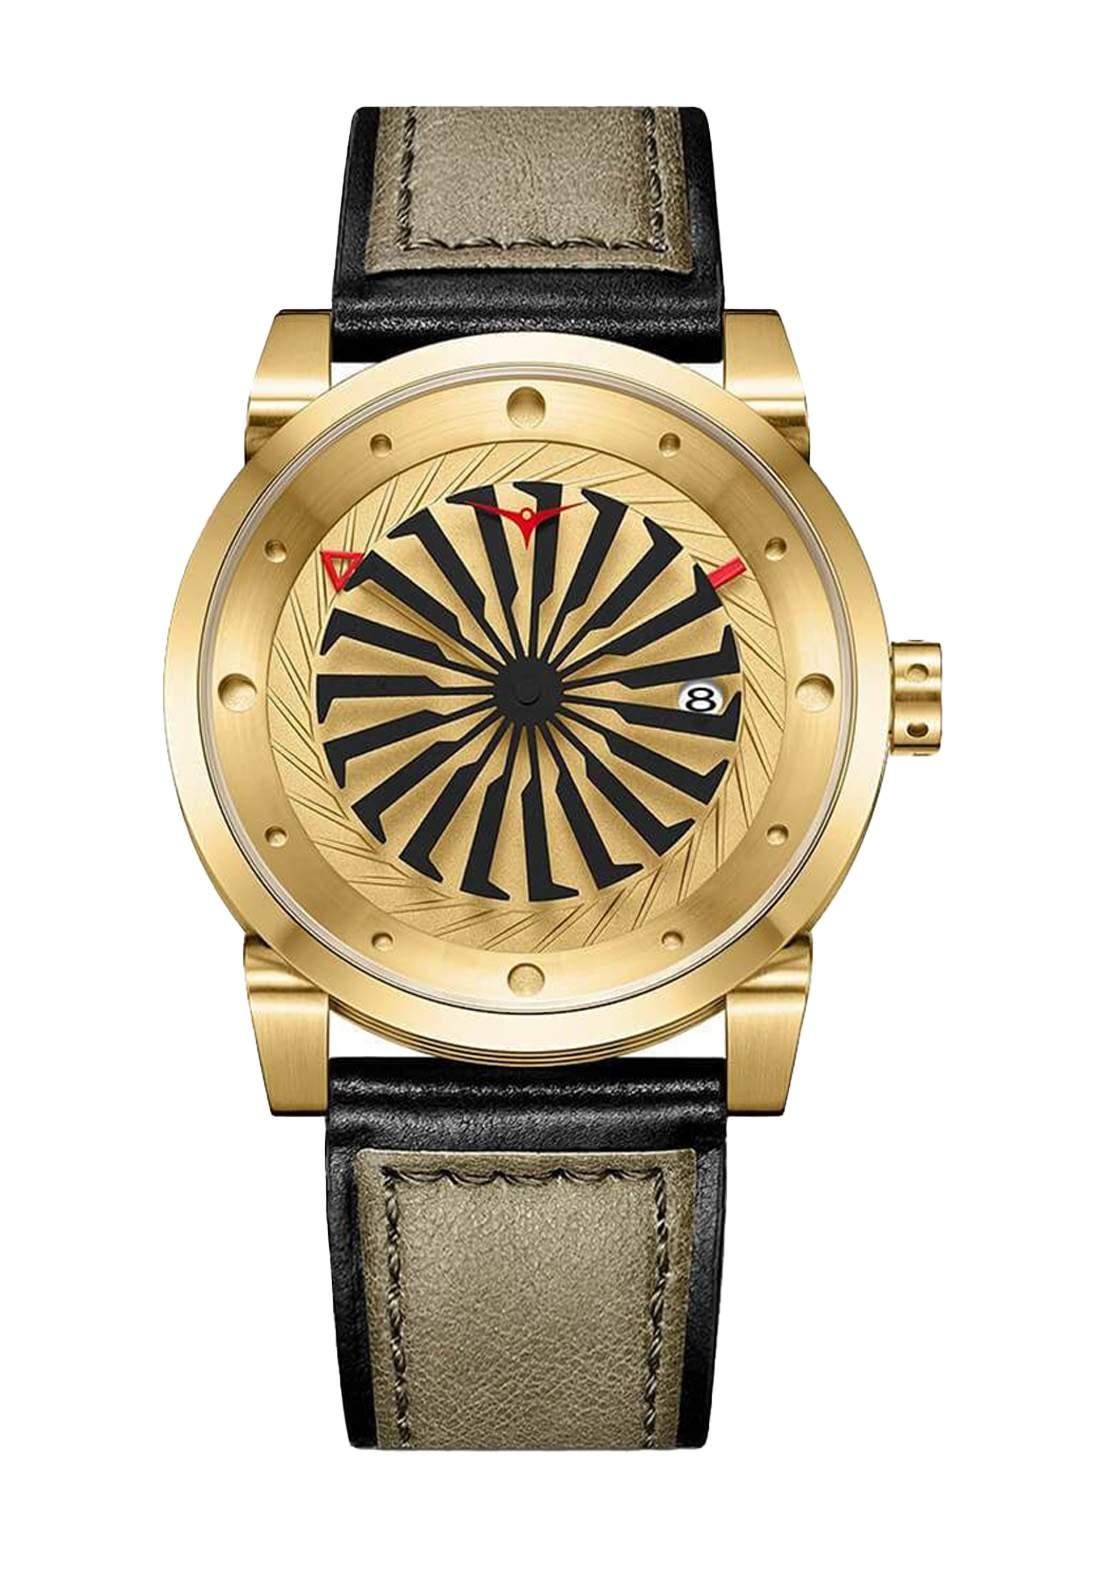 Zinvo Rival Corsa Watch For Men - Gold ساعة رجالي